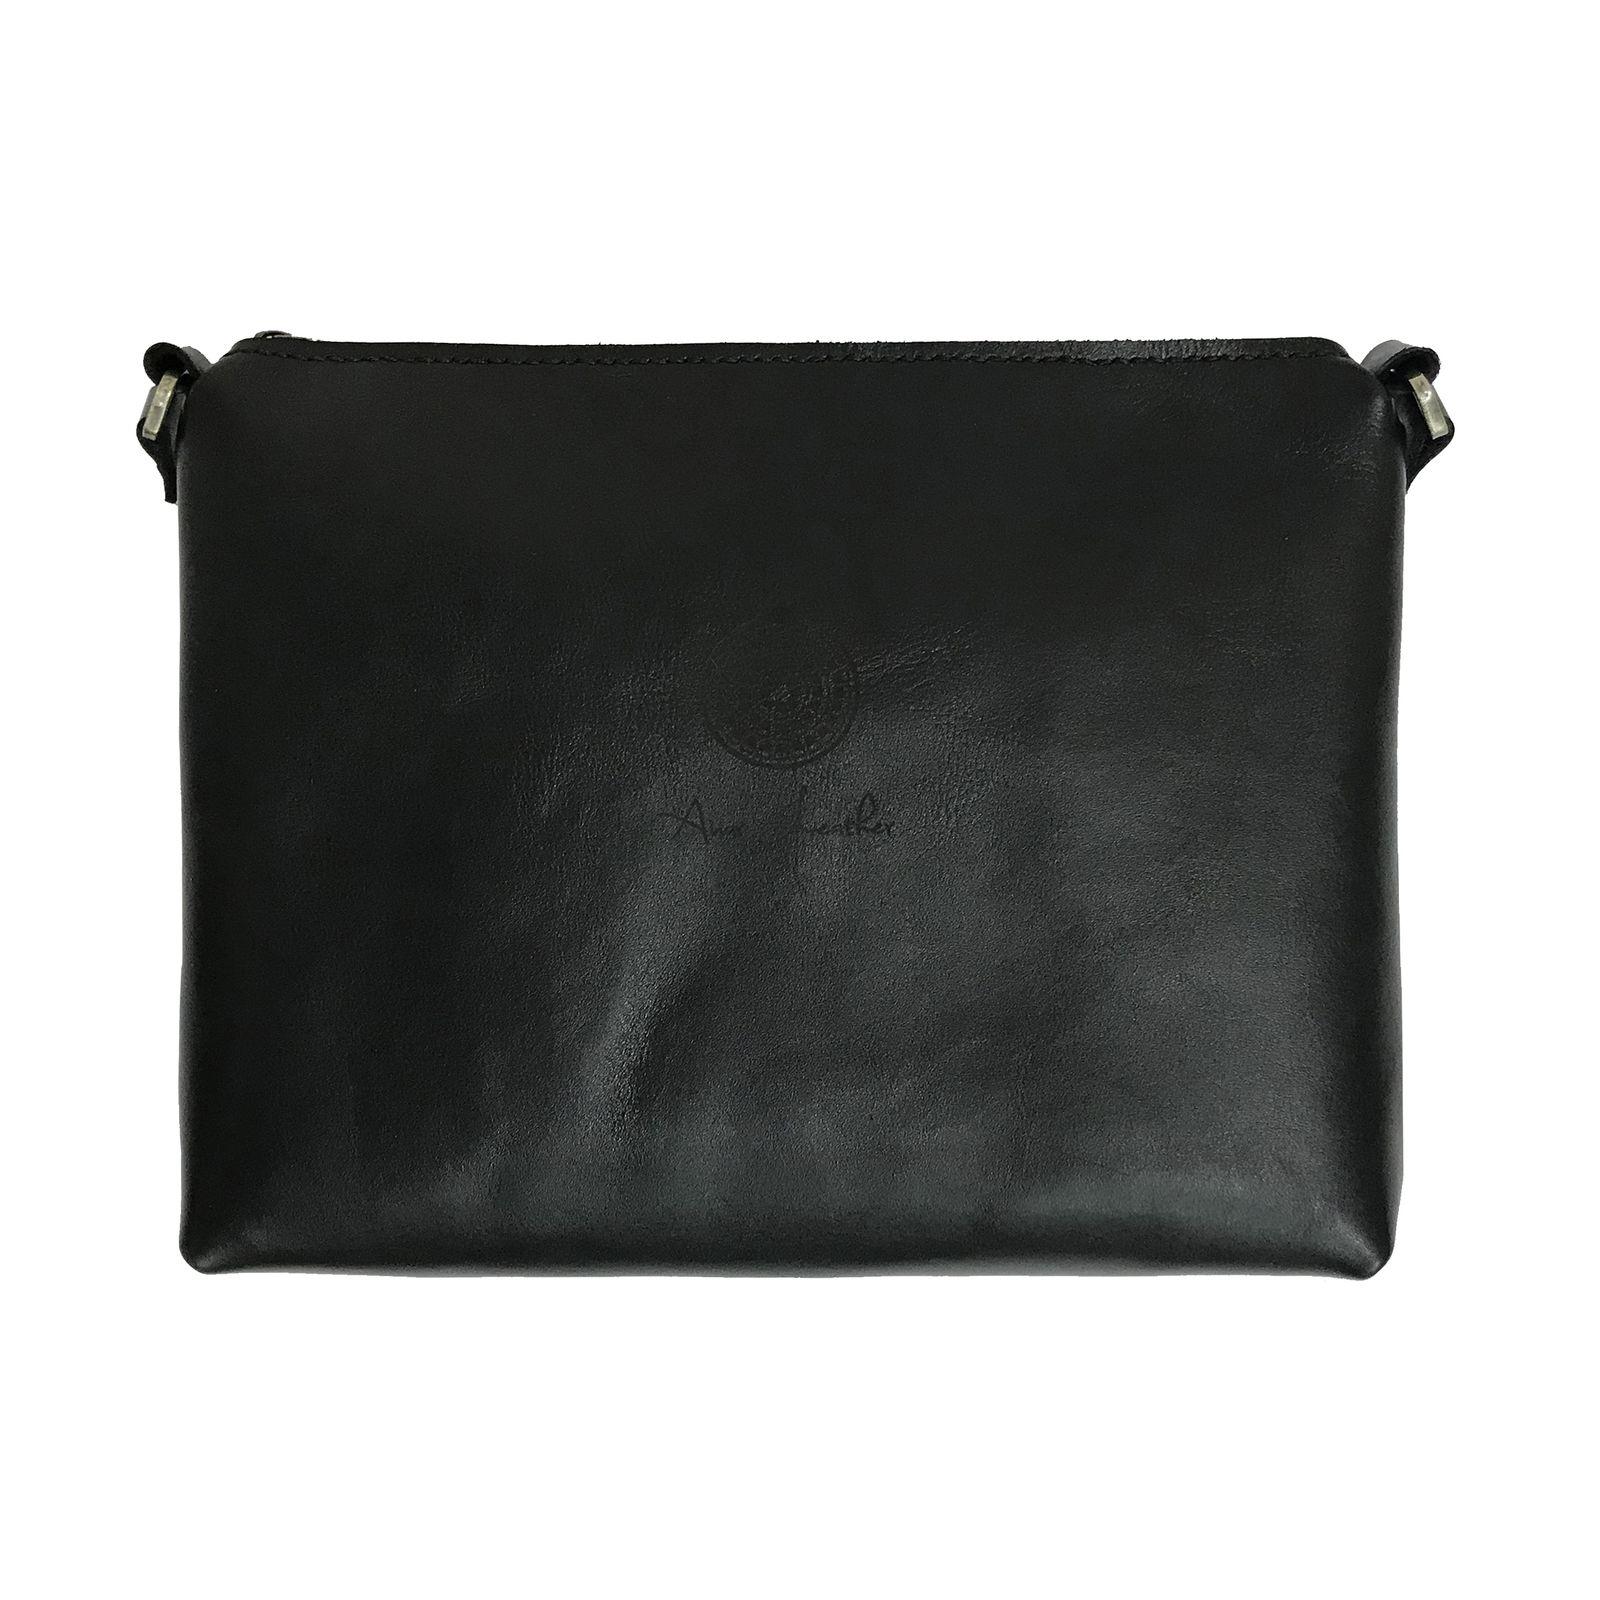 کیف رو دوشی انارلدر مدل لاگون پلاس -  - 2